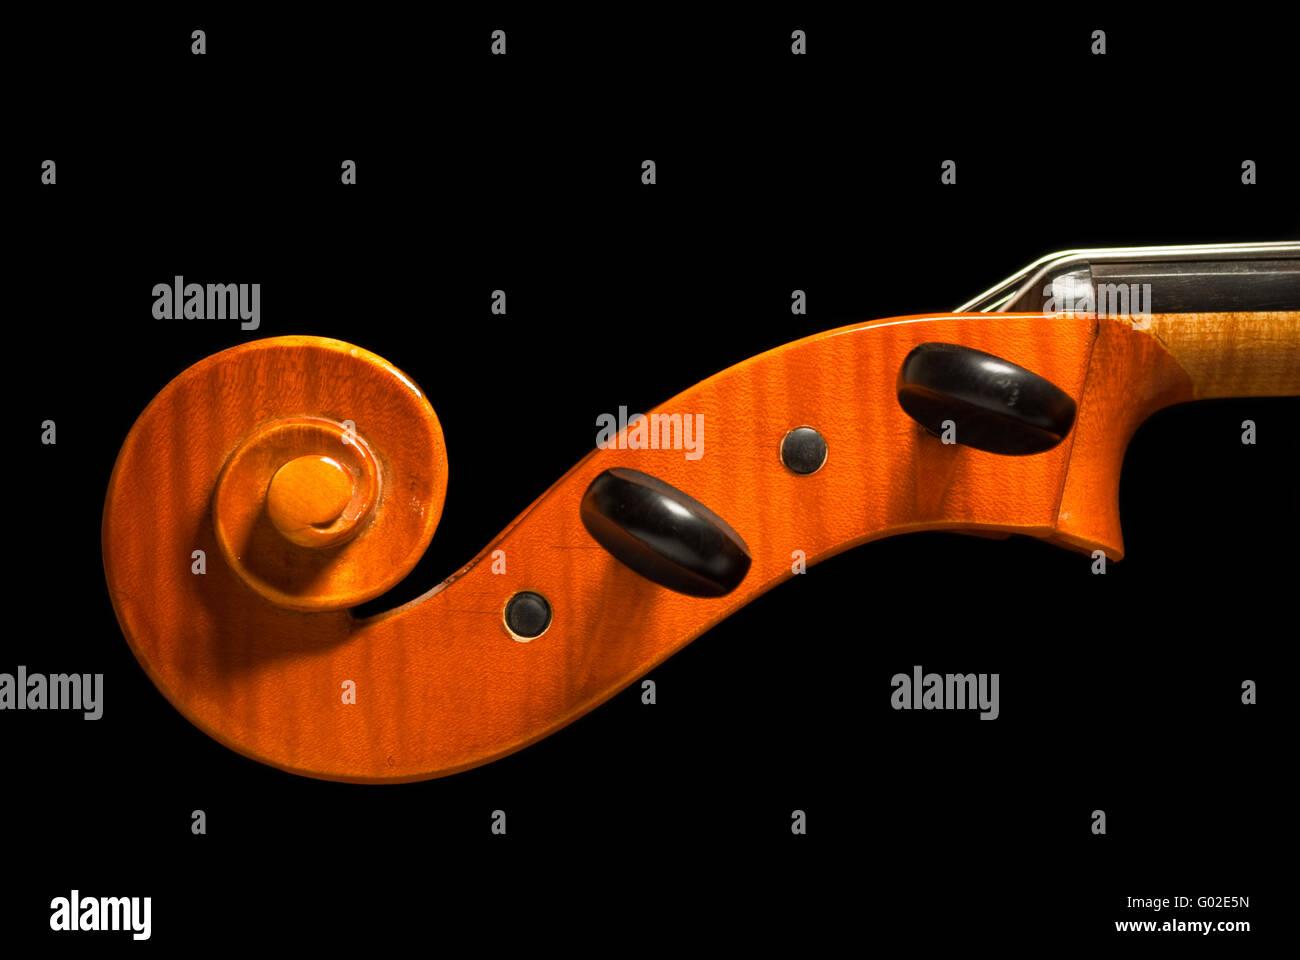 Head of a cello - Stock Image